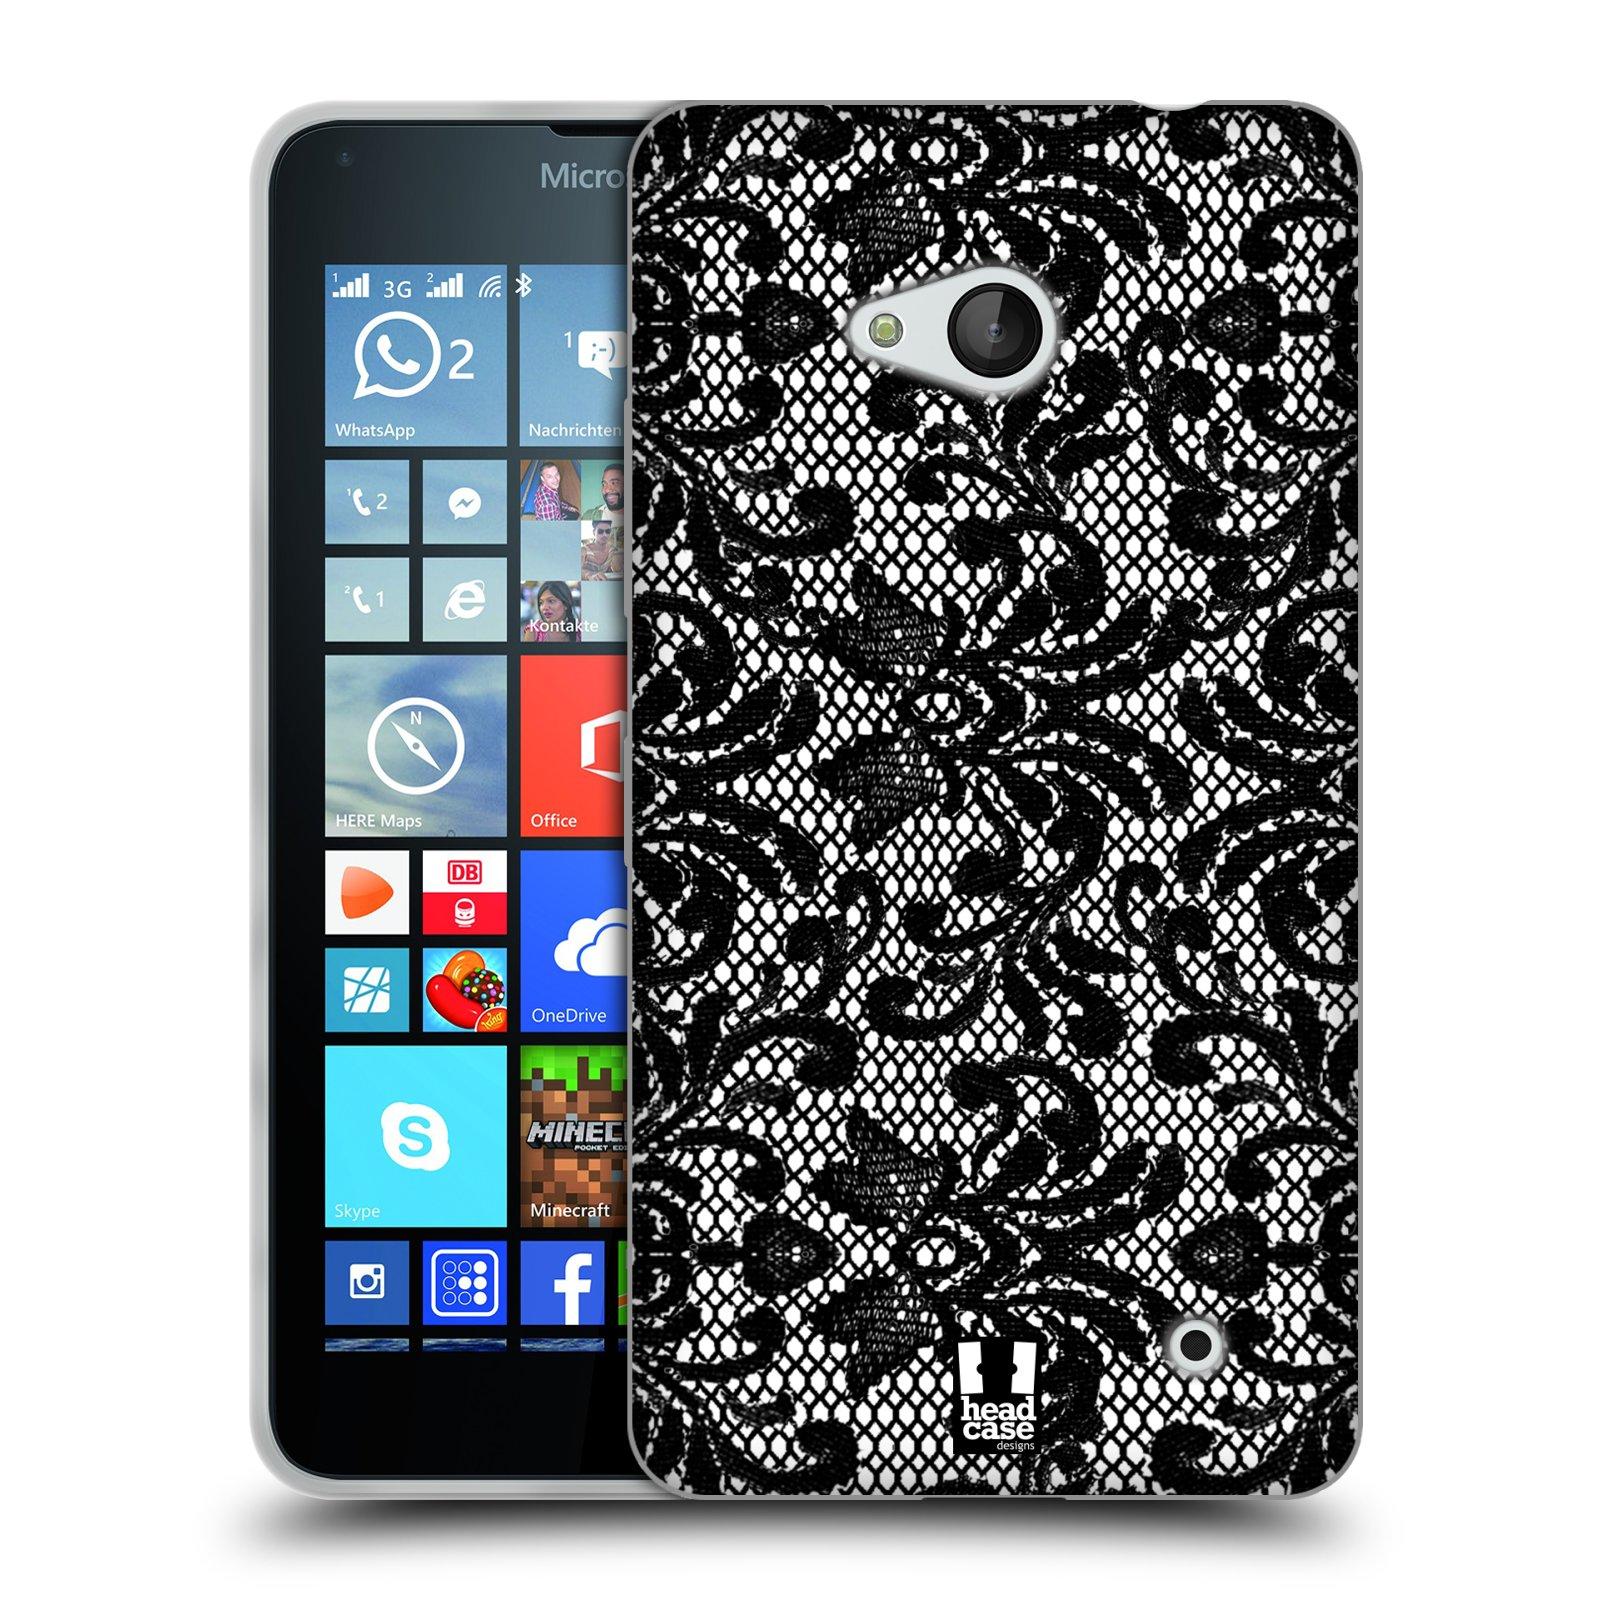 Silikonové pouzdro na mobil Microsoft Lumia 640 HEAD CASE KRAJKA (Silikonový kryt či obal na mobilní telefon Microsoft Lumia 640)